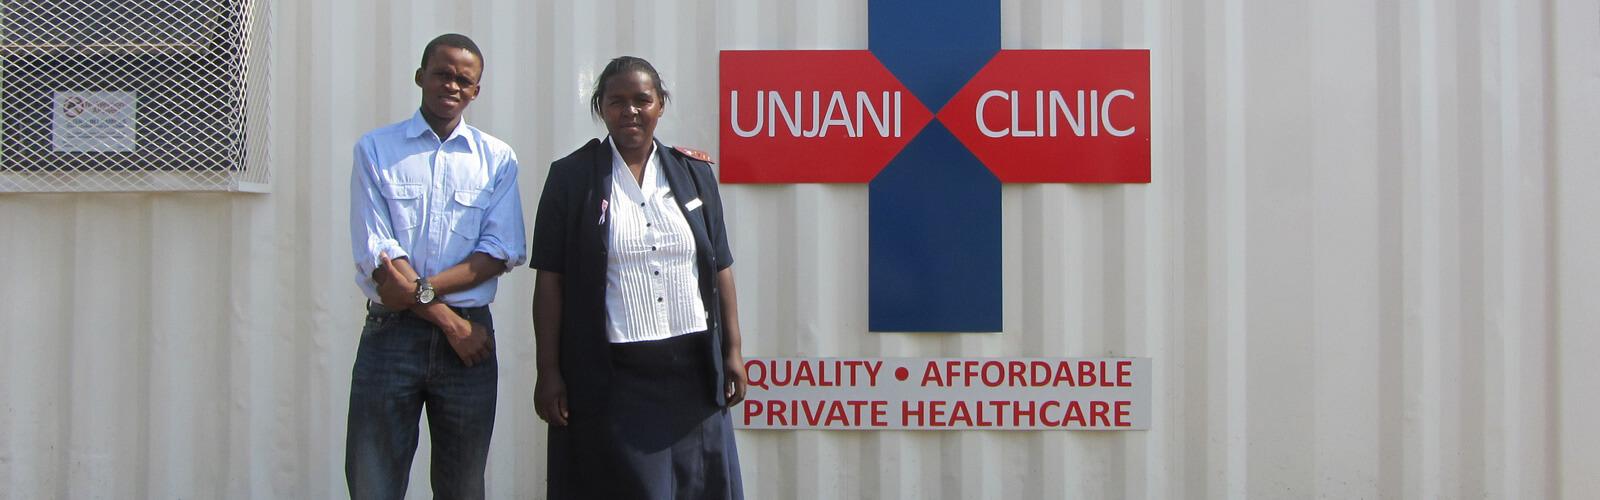 Photo: Unjani Clinics